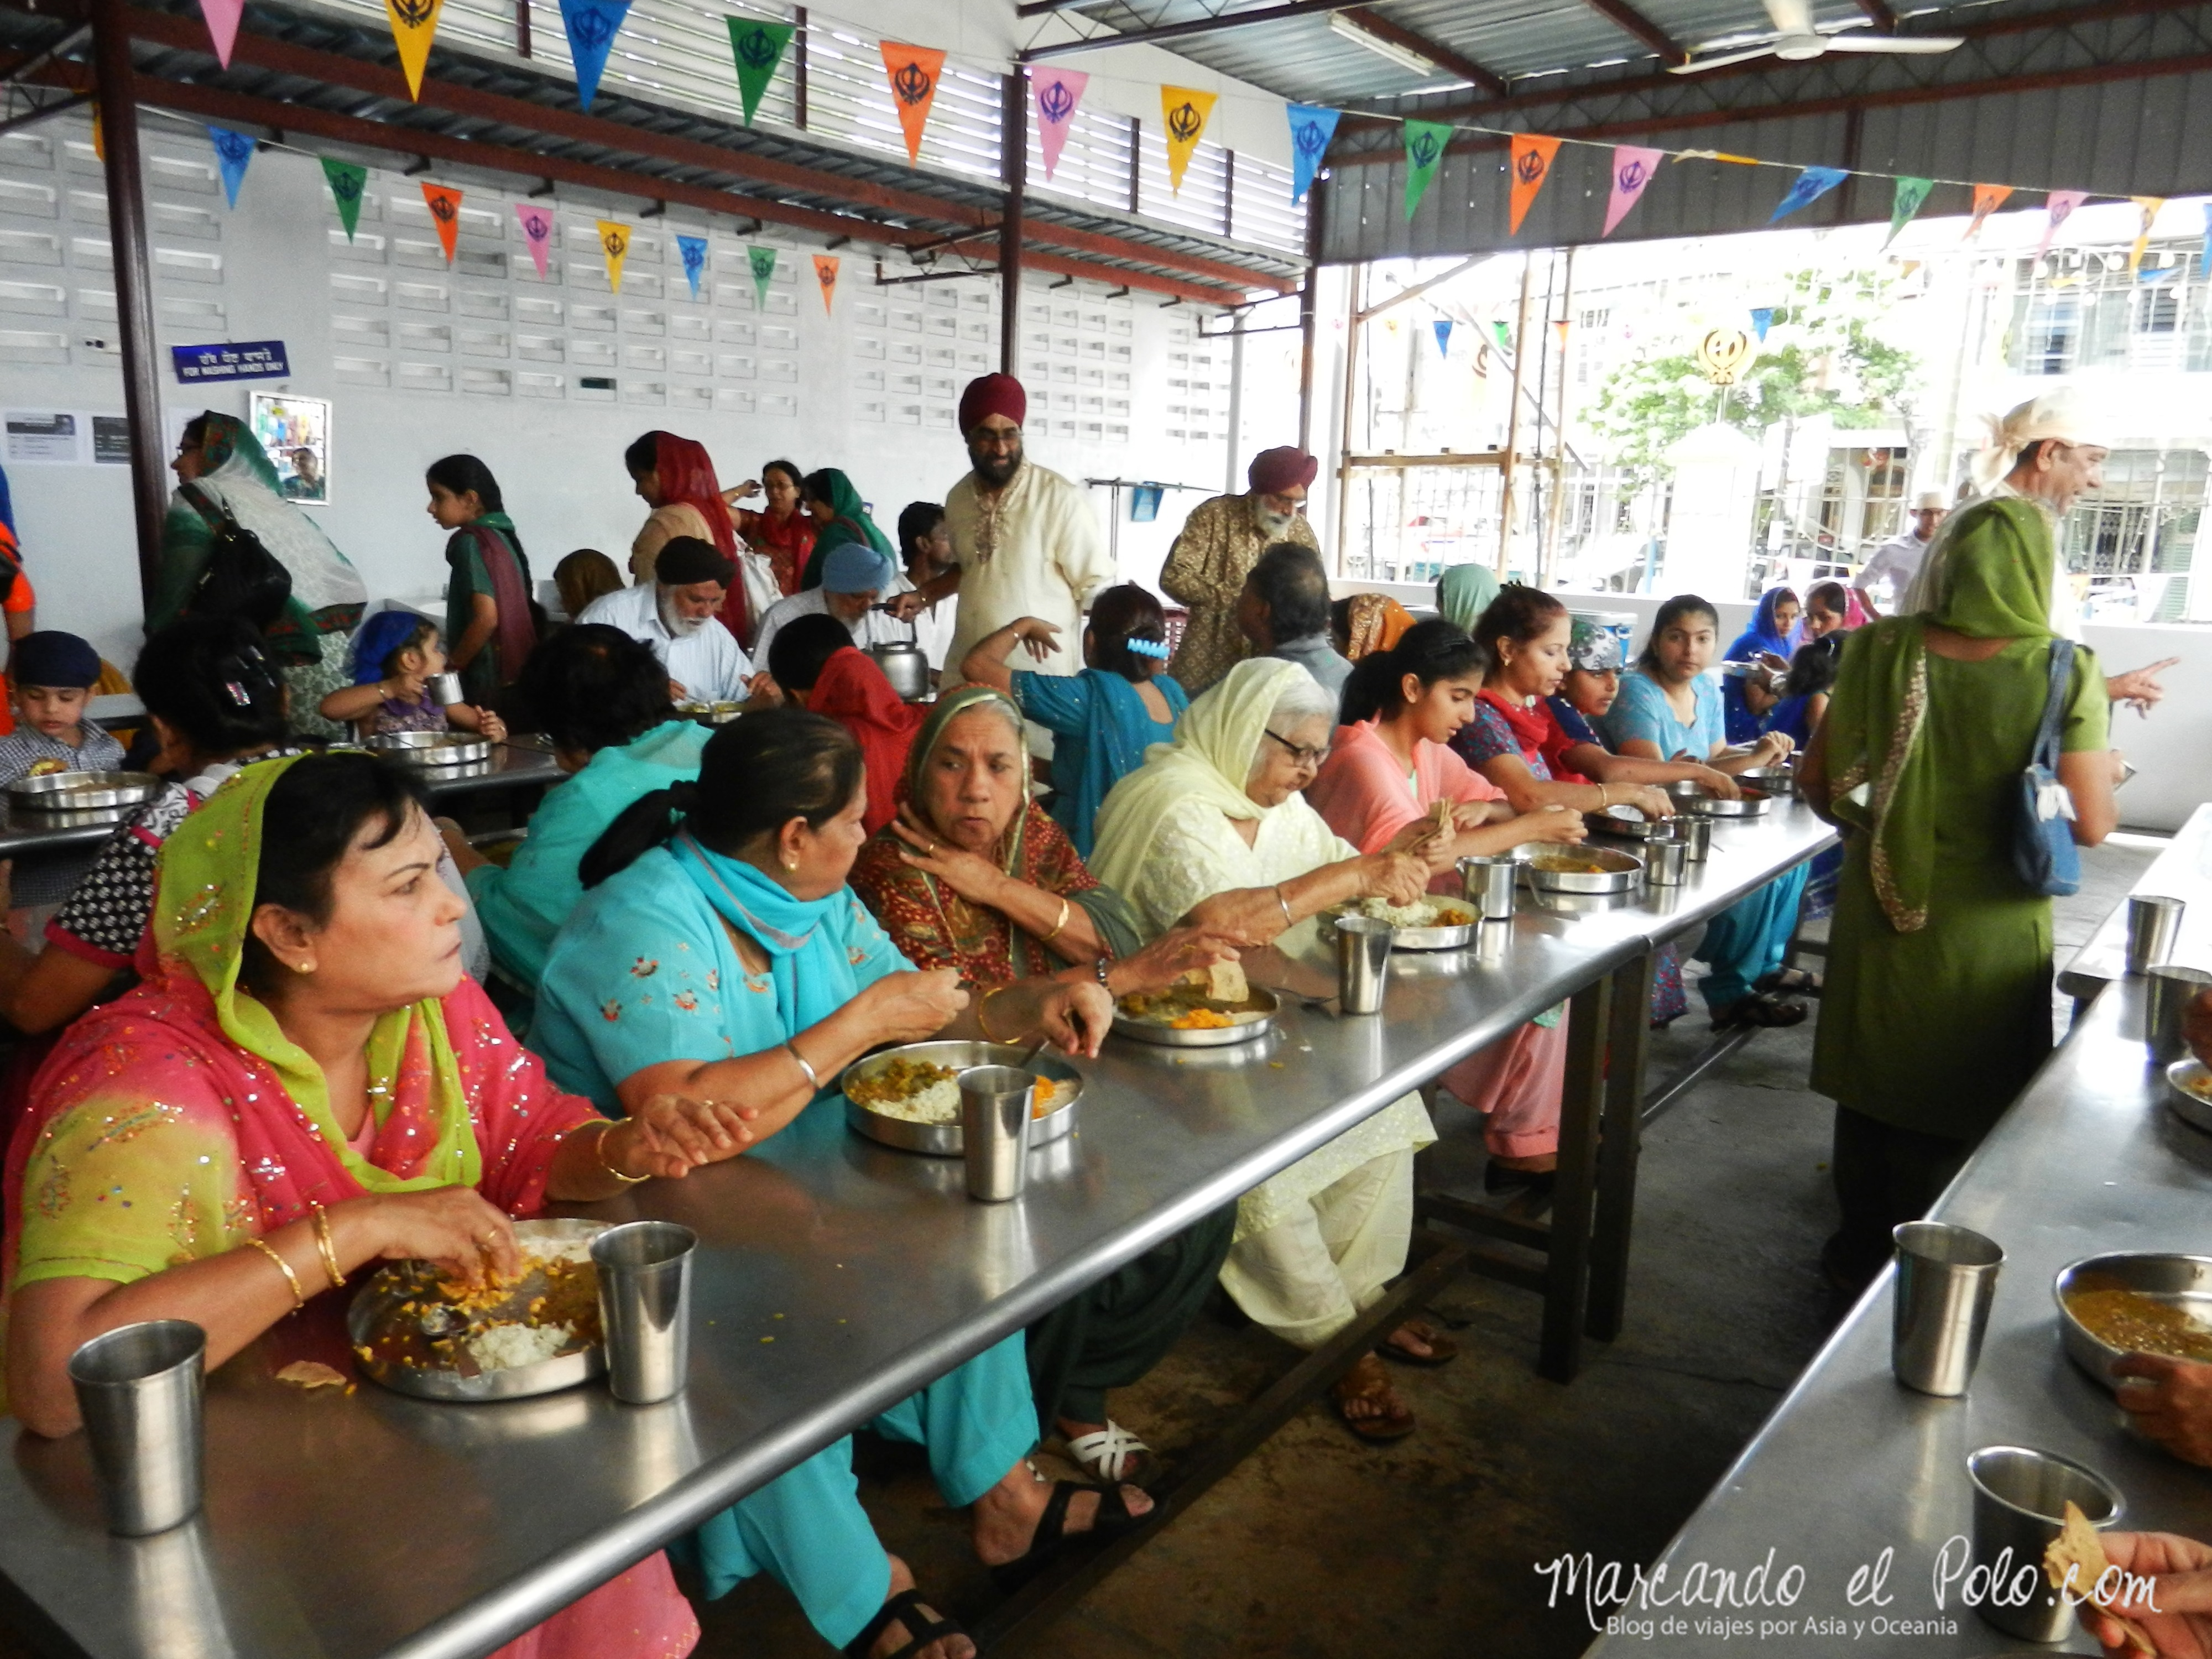 Casamiento Sikh en Penang, Malasia 27